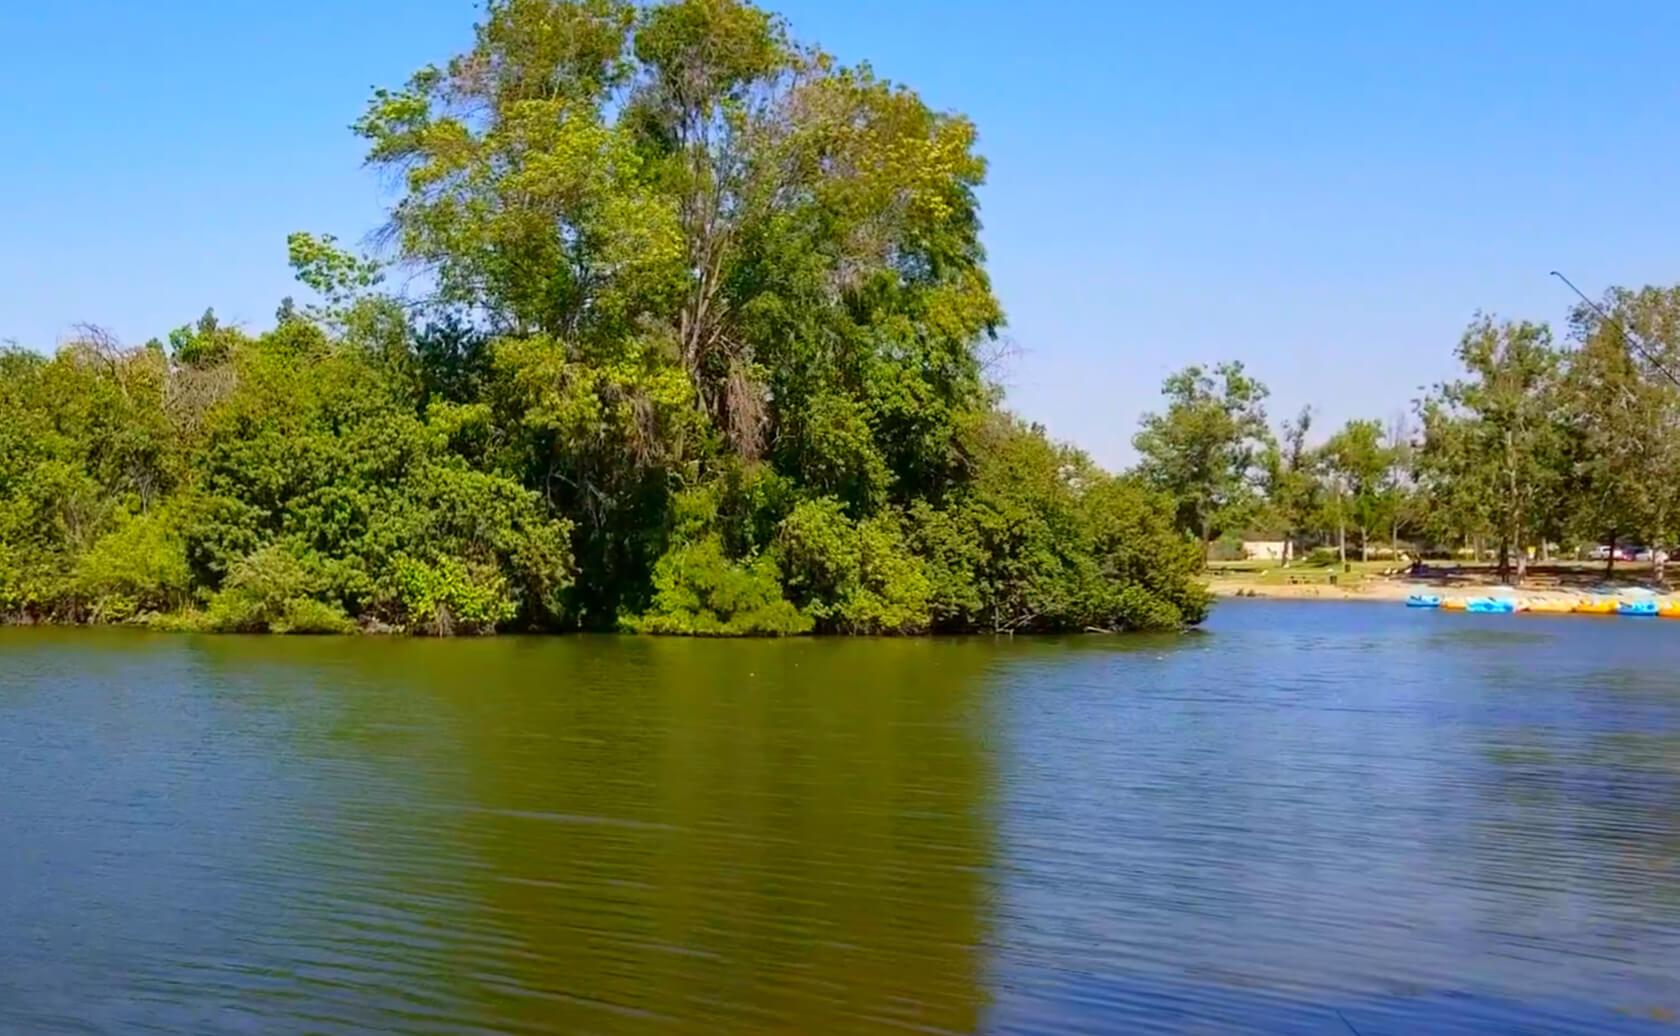 Legg-Lake-Fishing-Guide-Report-South-El-Monte-CA-91733-03